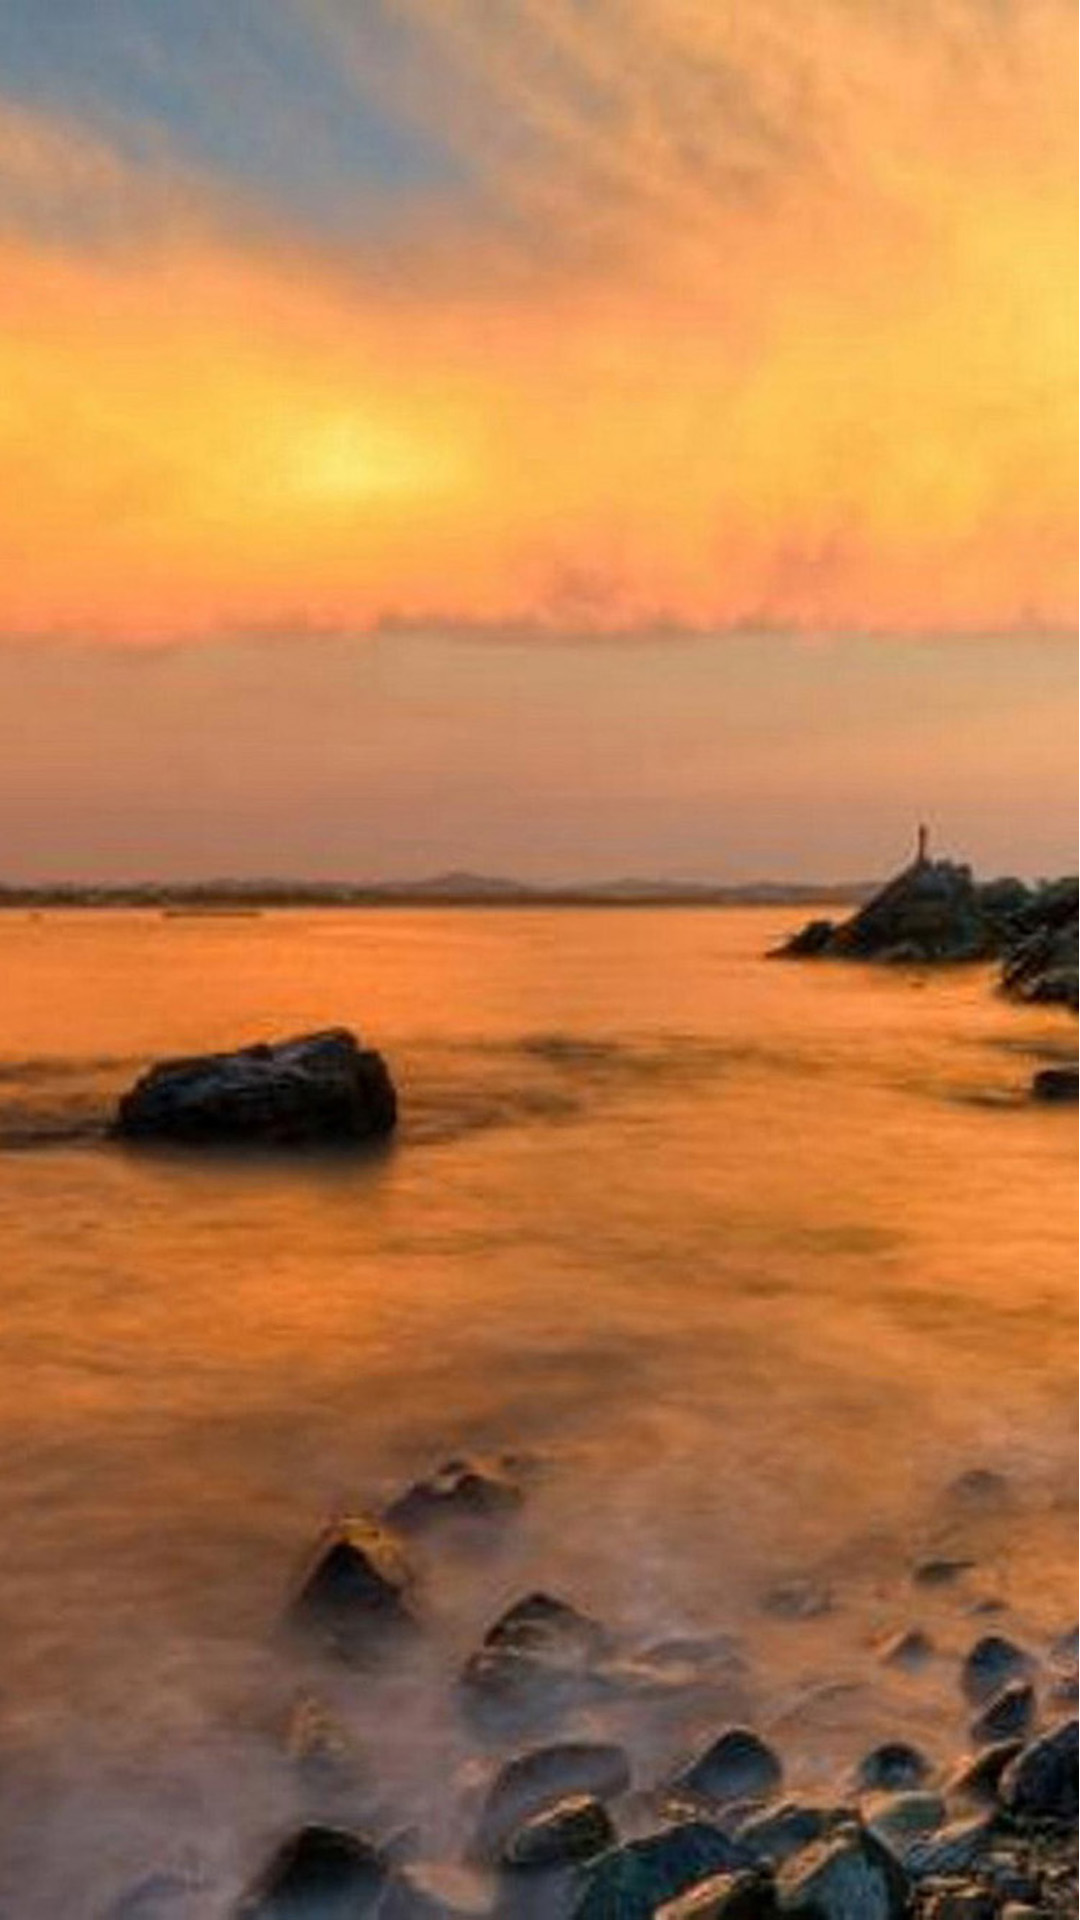 Beach Sun and Stones